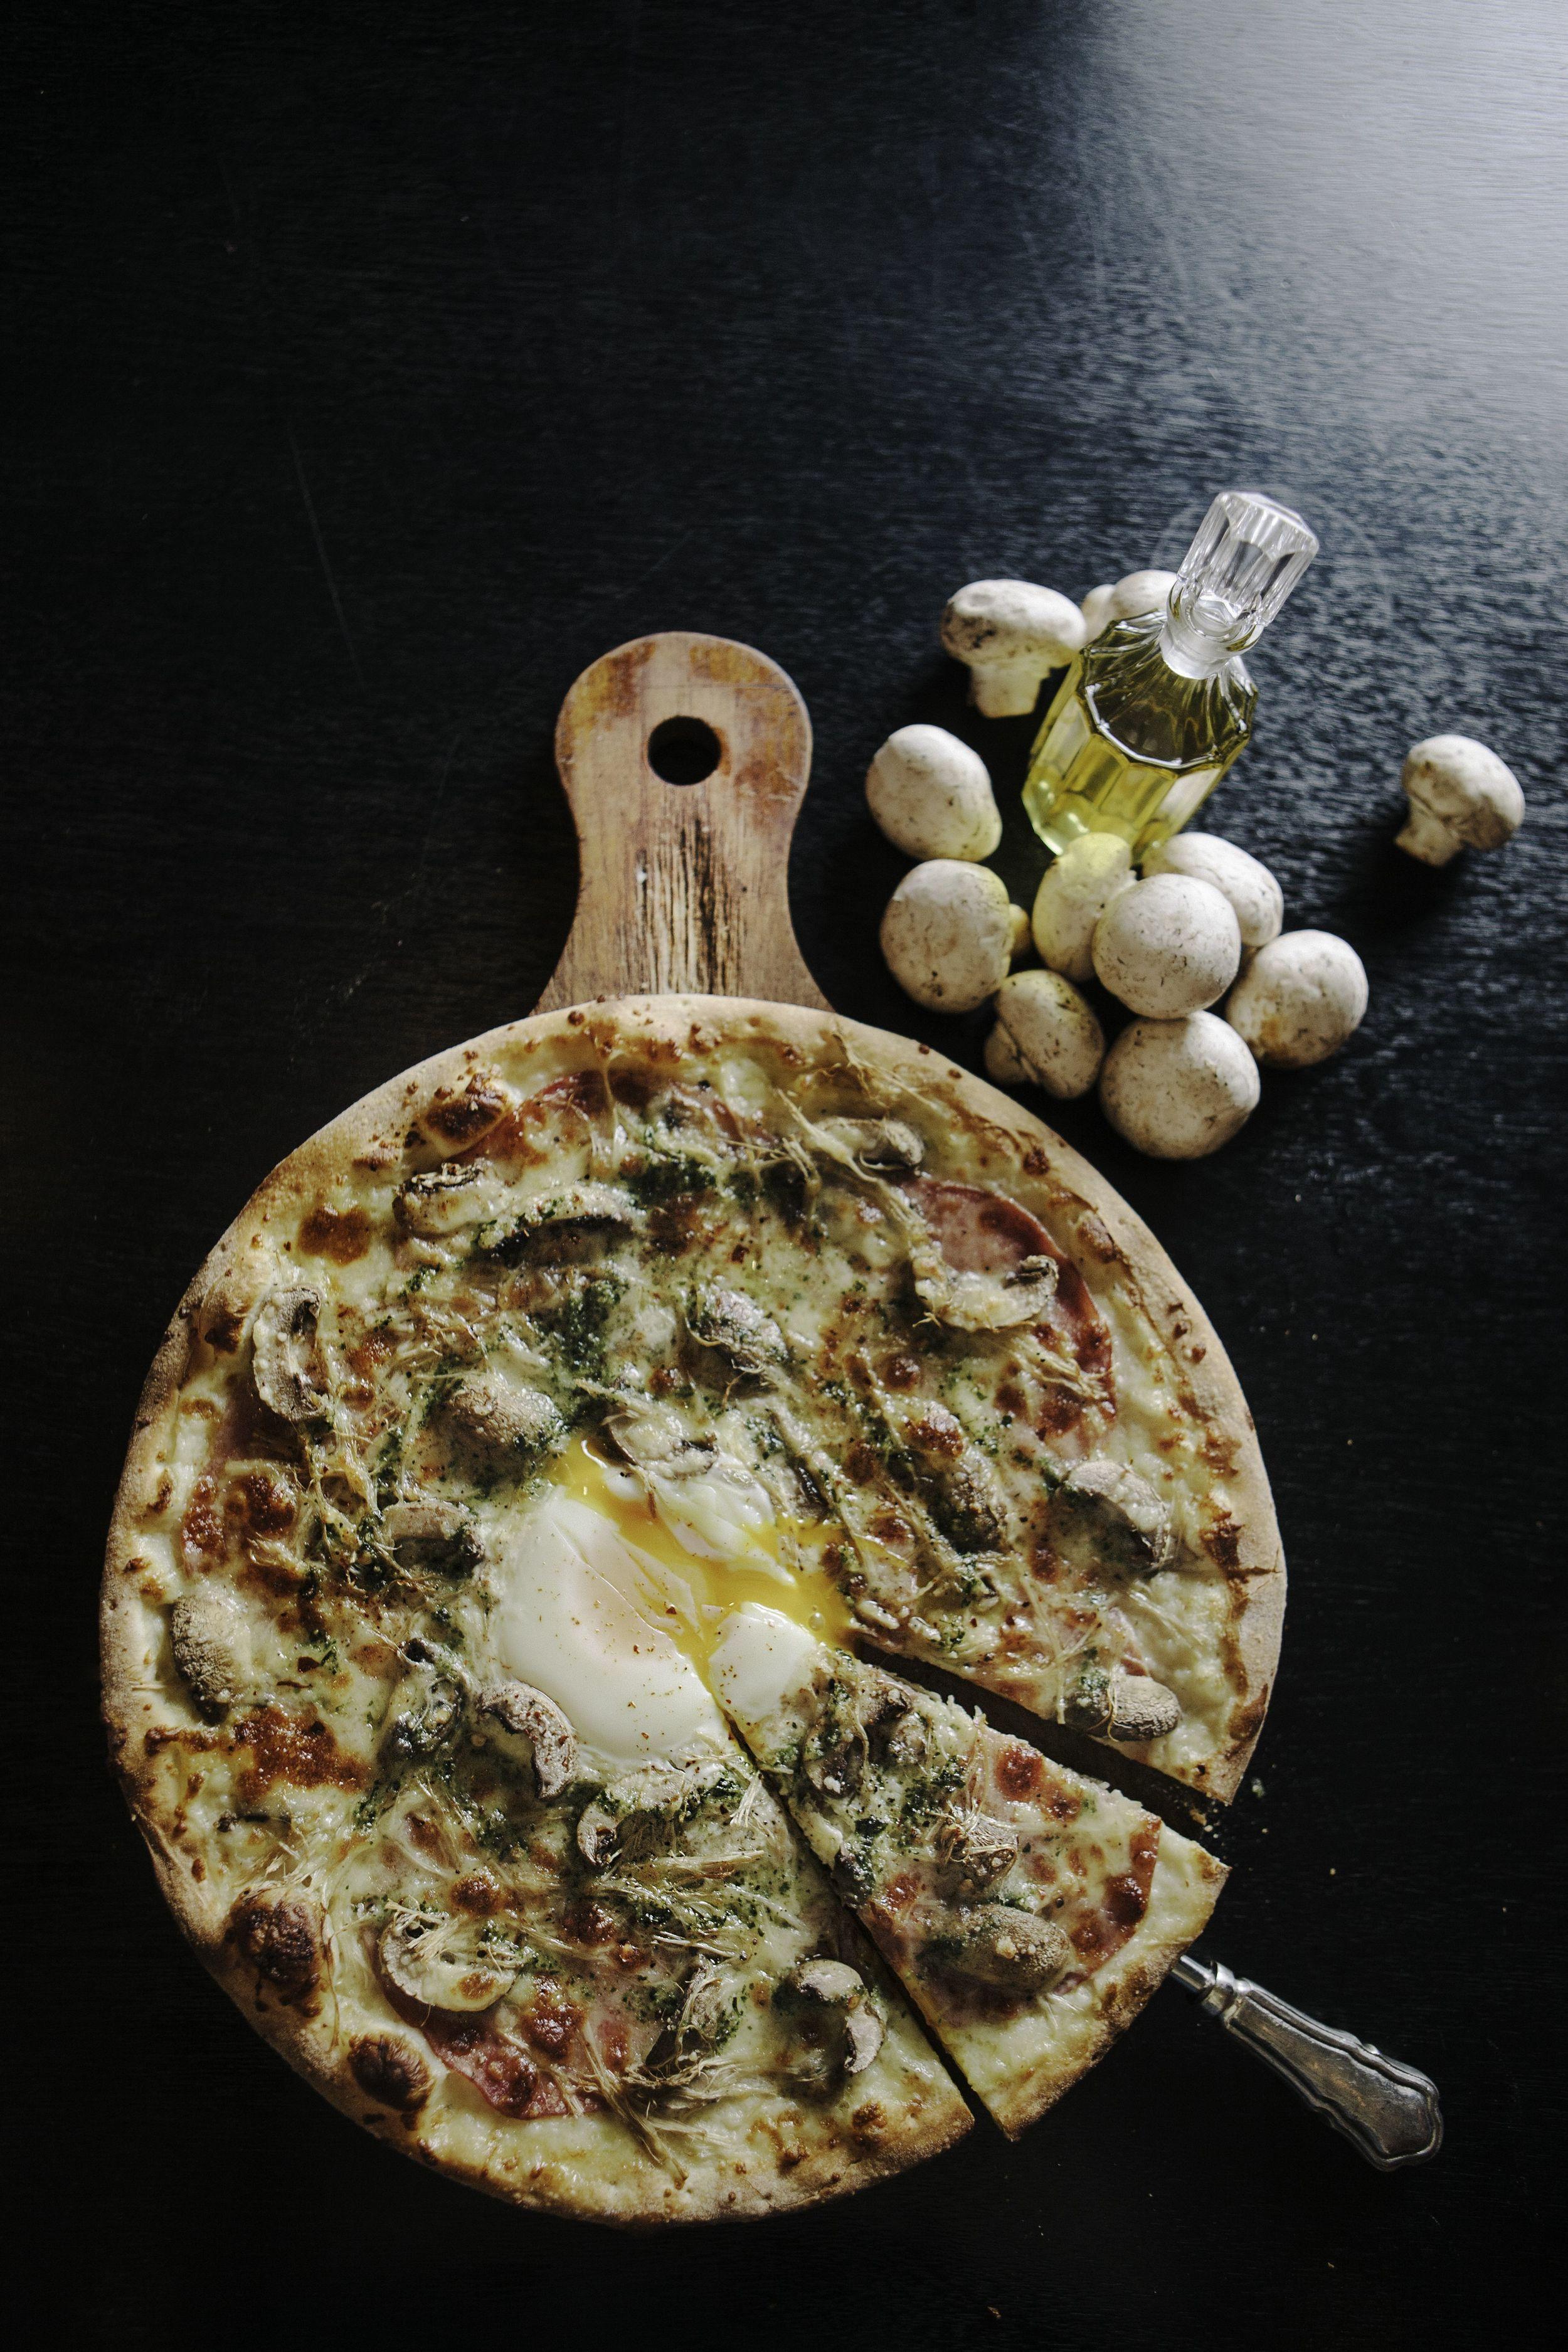 pizza3_1.jpg